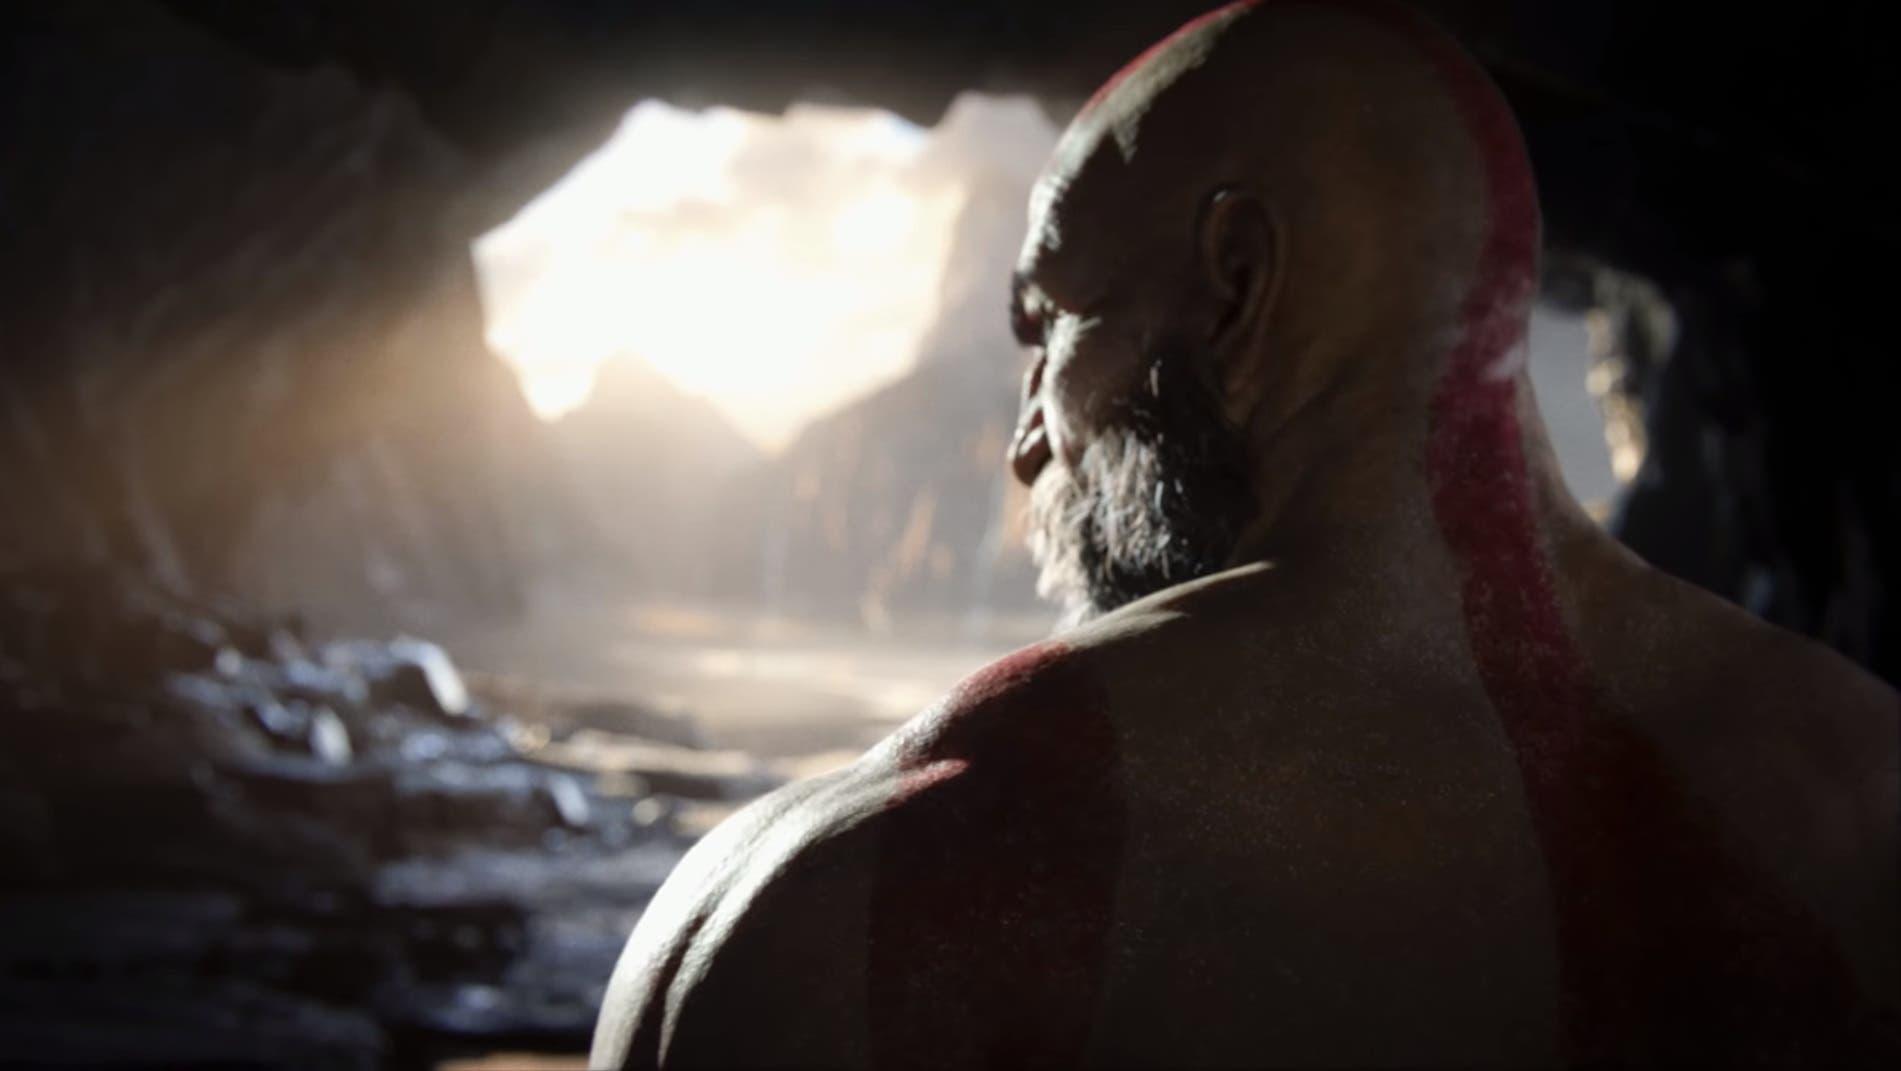 Imagen de El mundo se rinde ante la obra de Prime 1 Studio sobre God of War